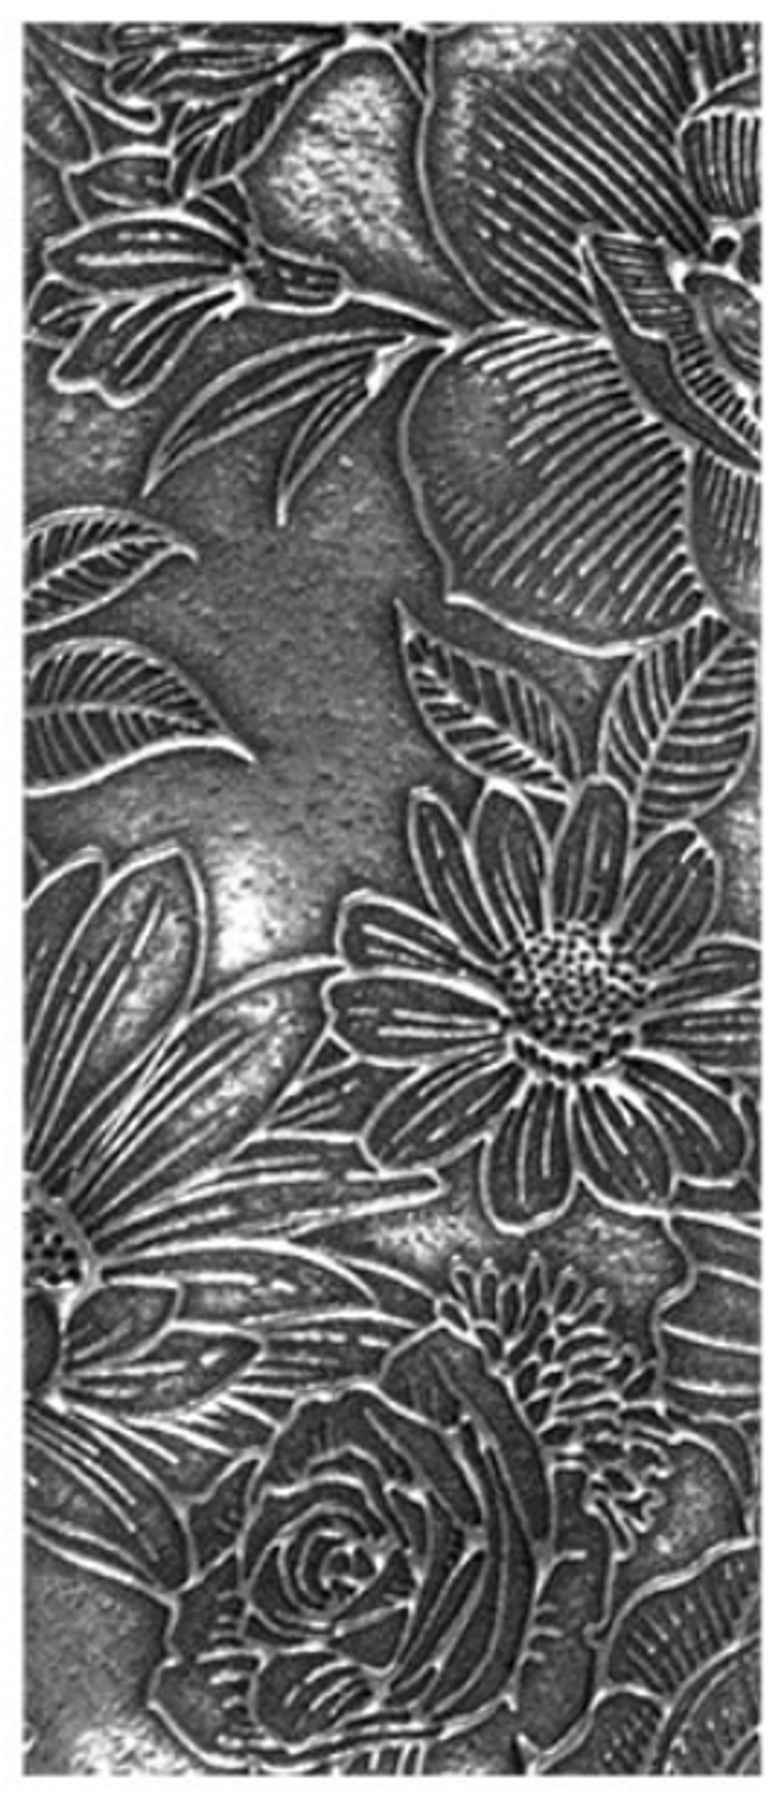 Example of Grandma's Garden in silver clay.